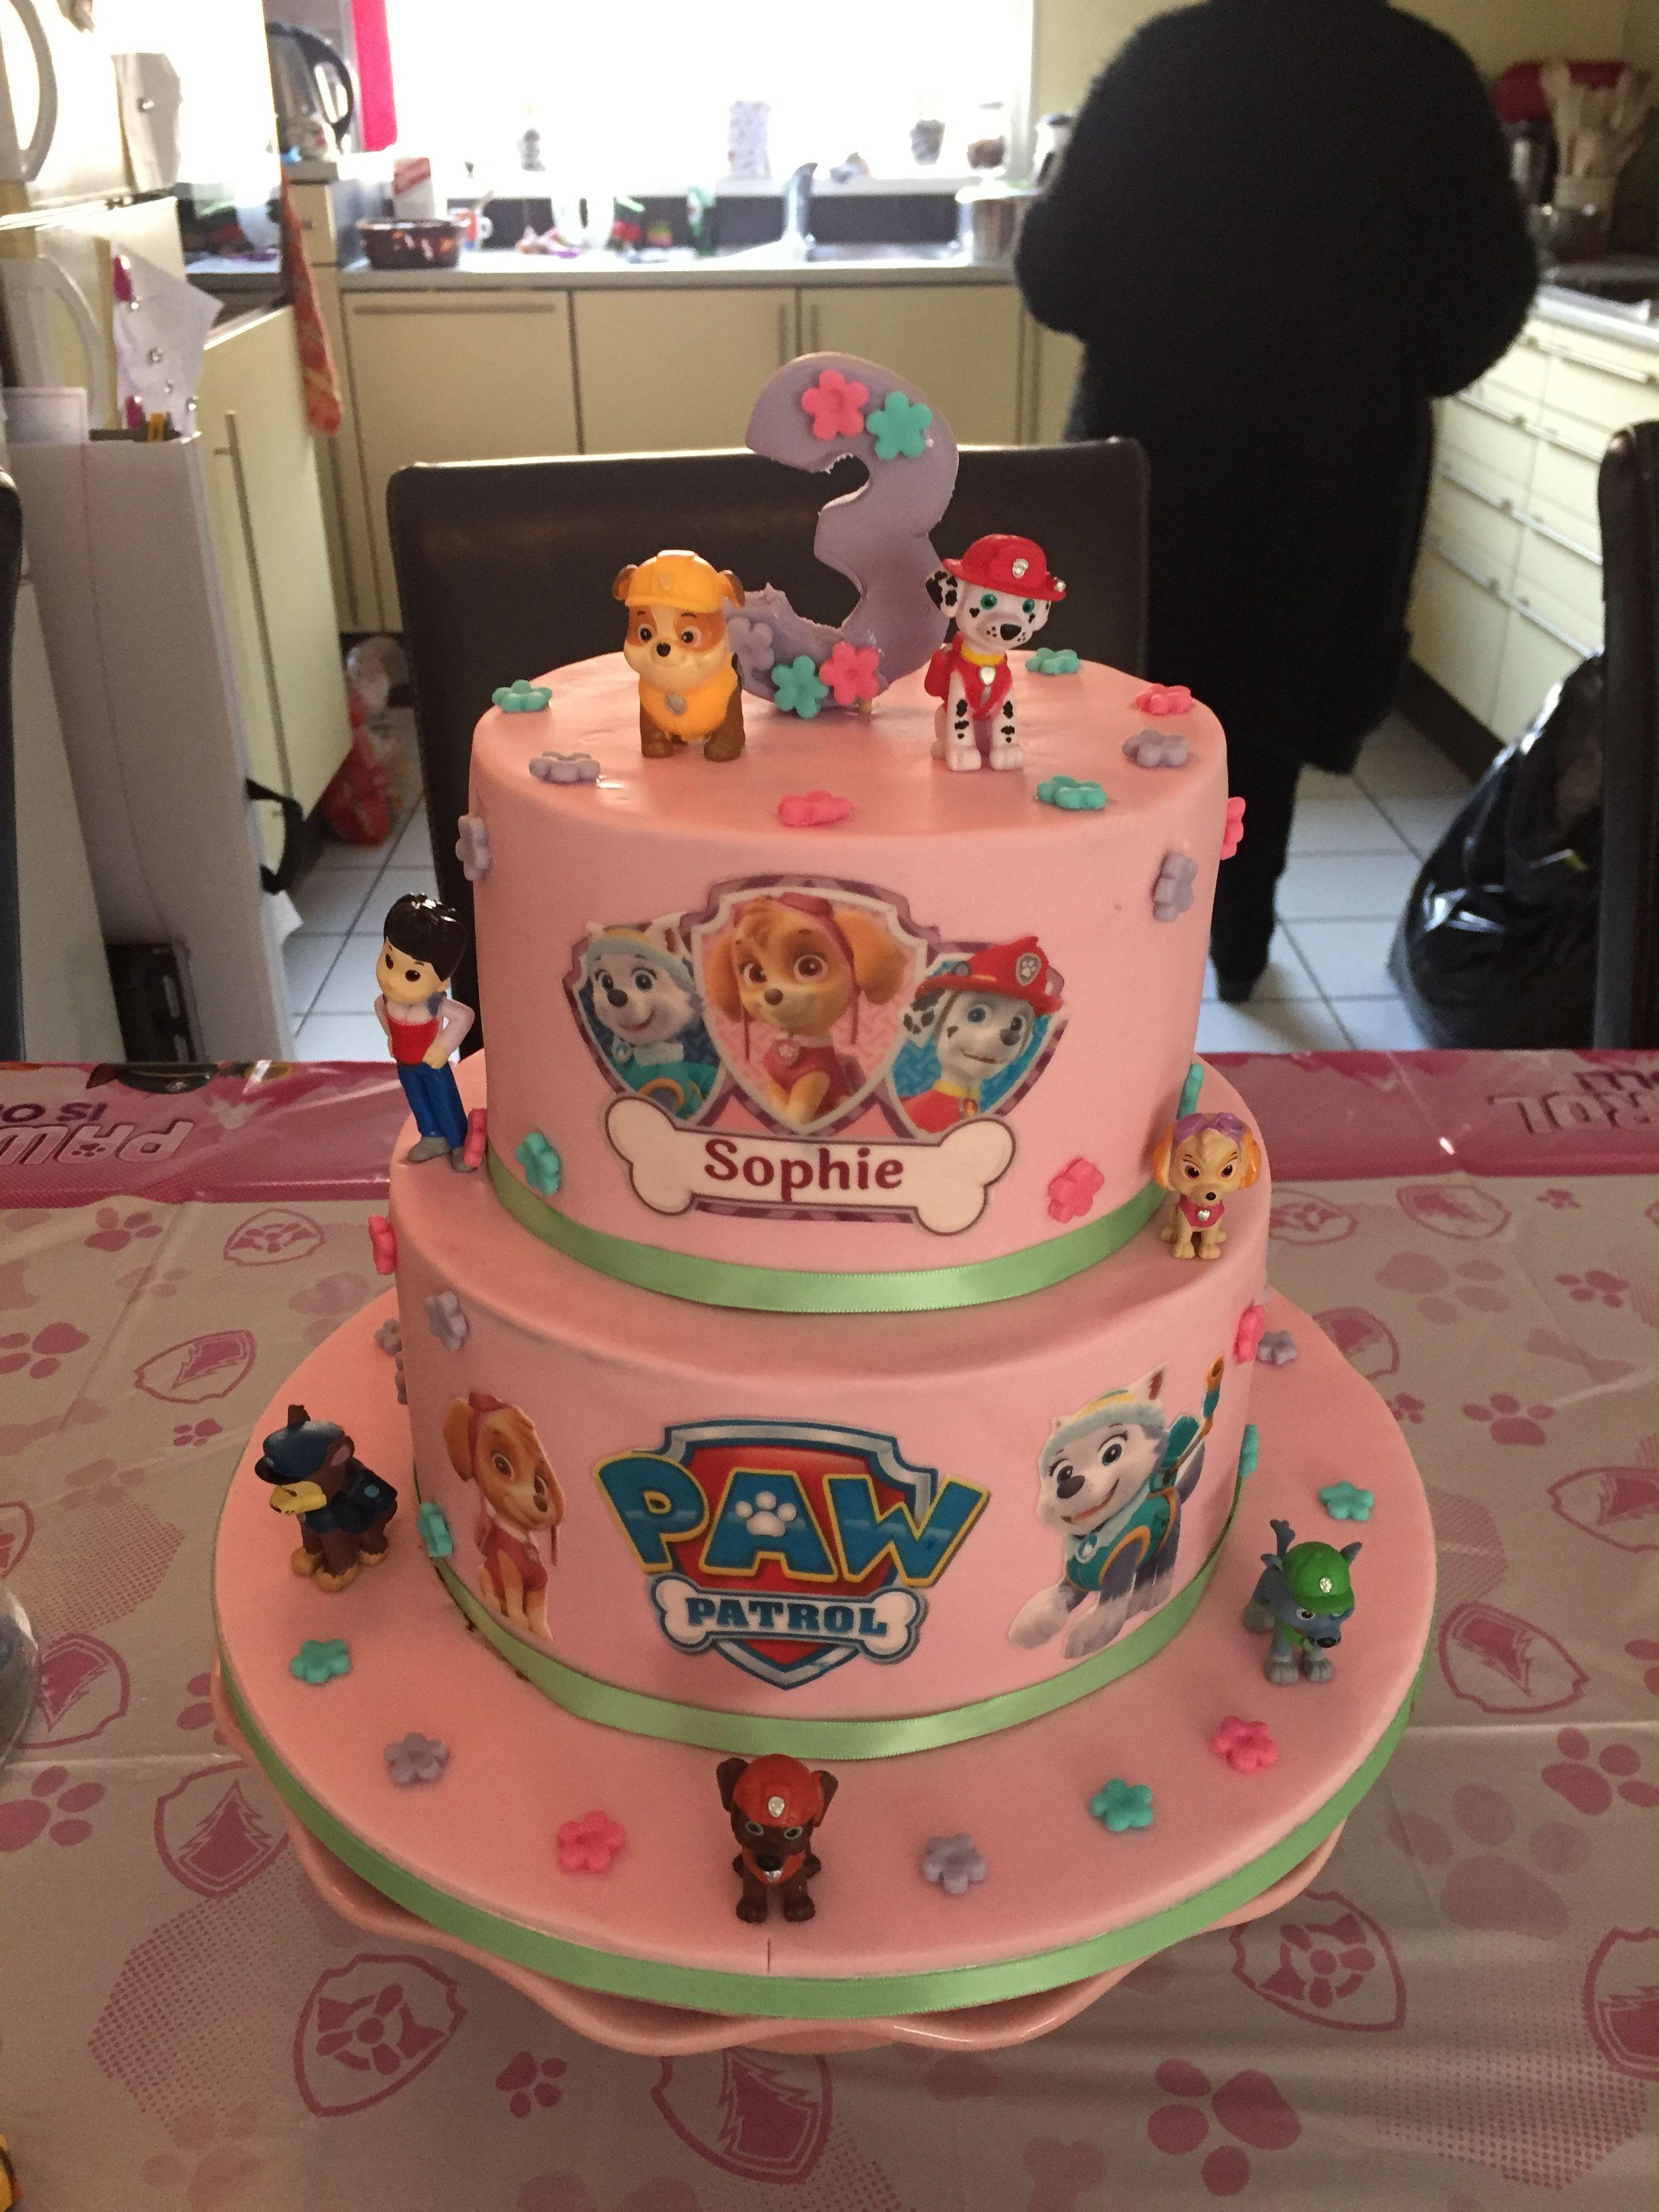 Paw Patrol Gluten Free Birthday Cake For My Girls 3rd